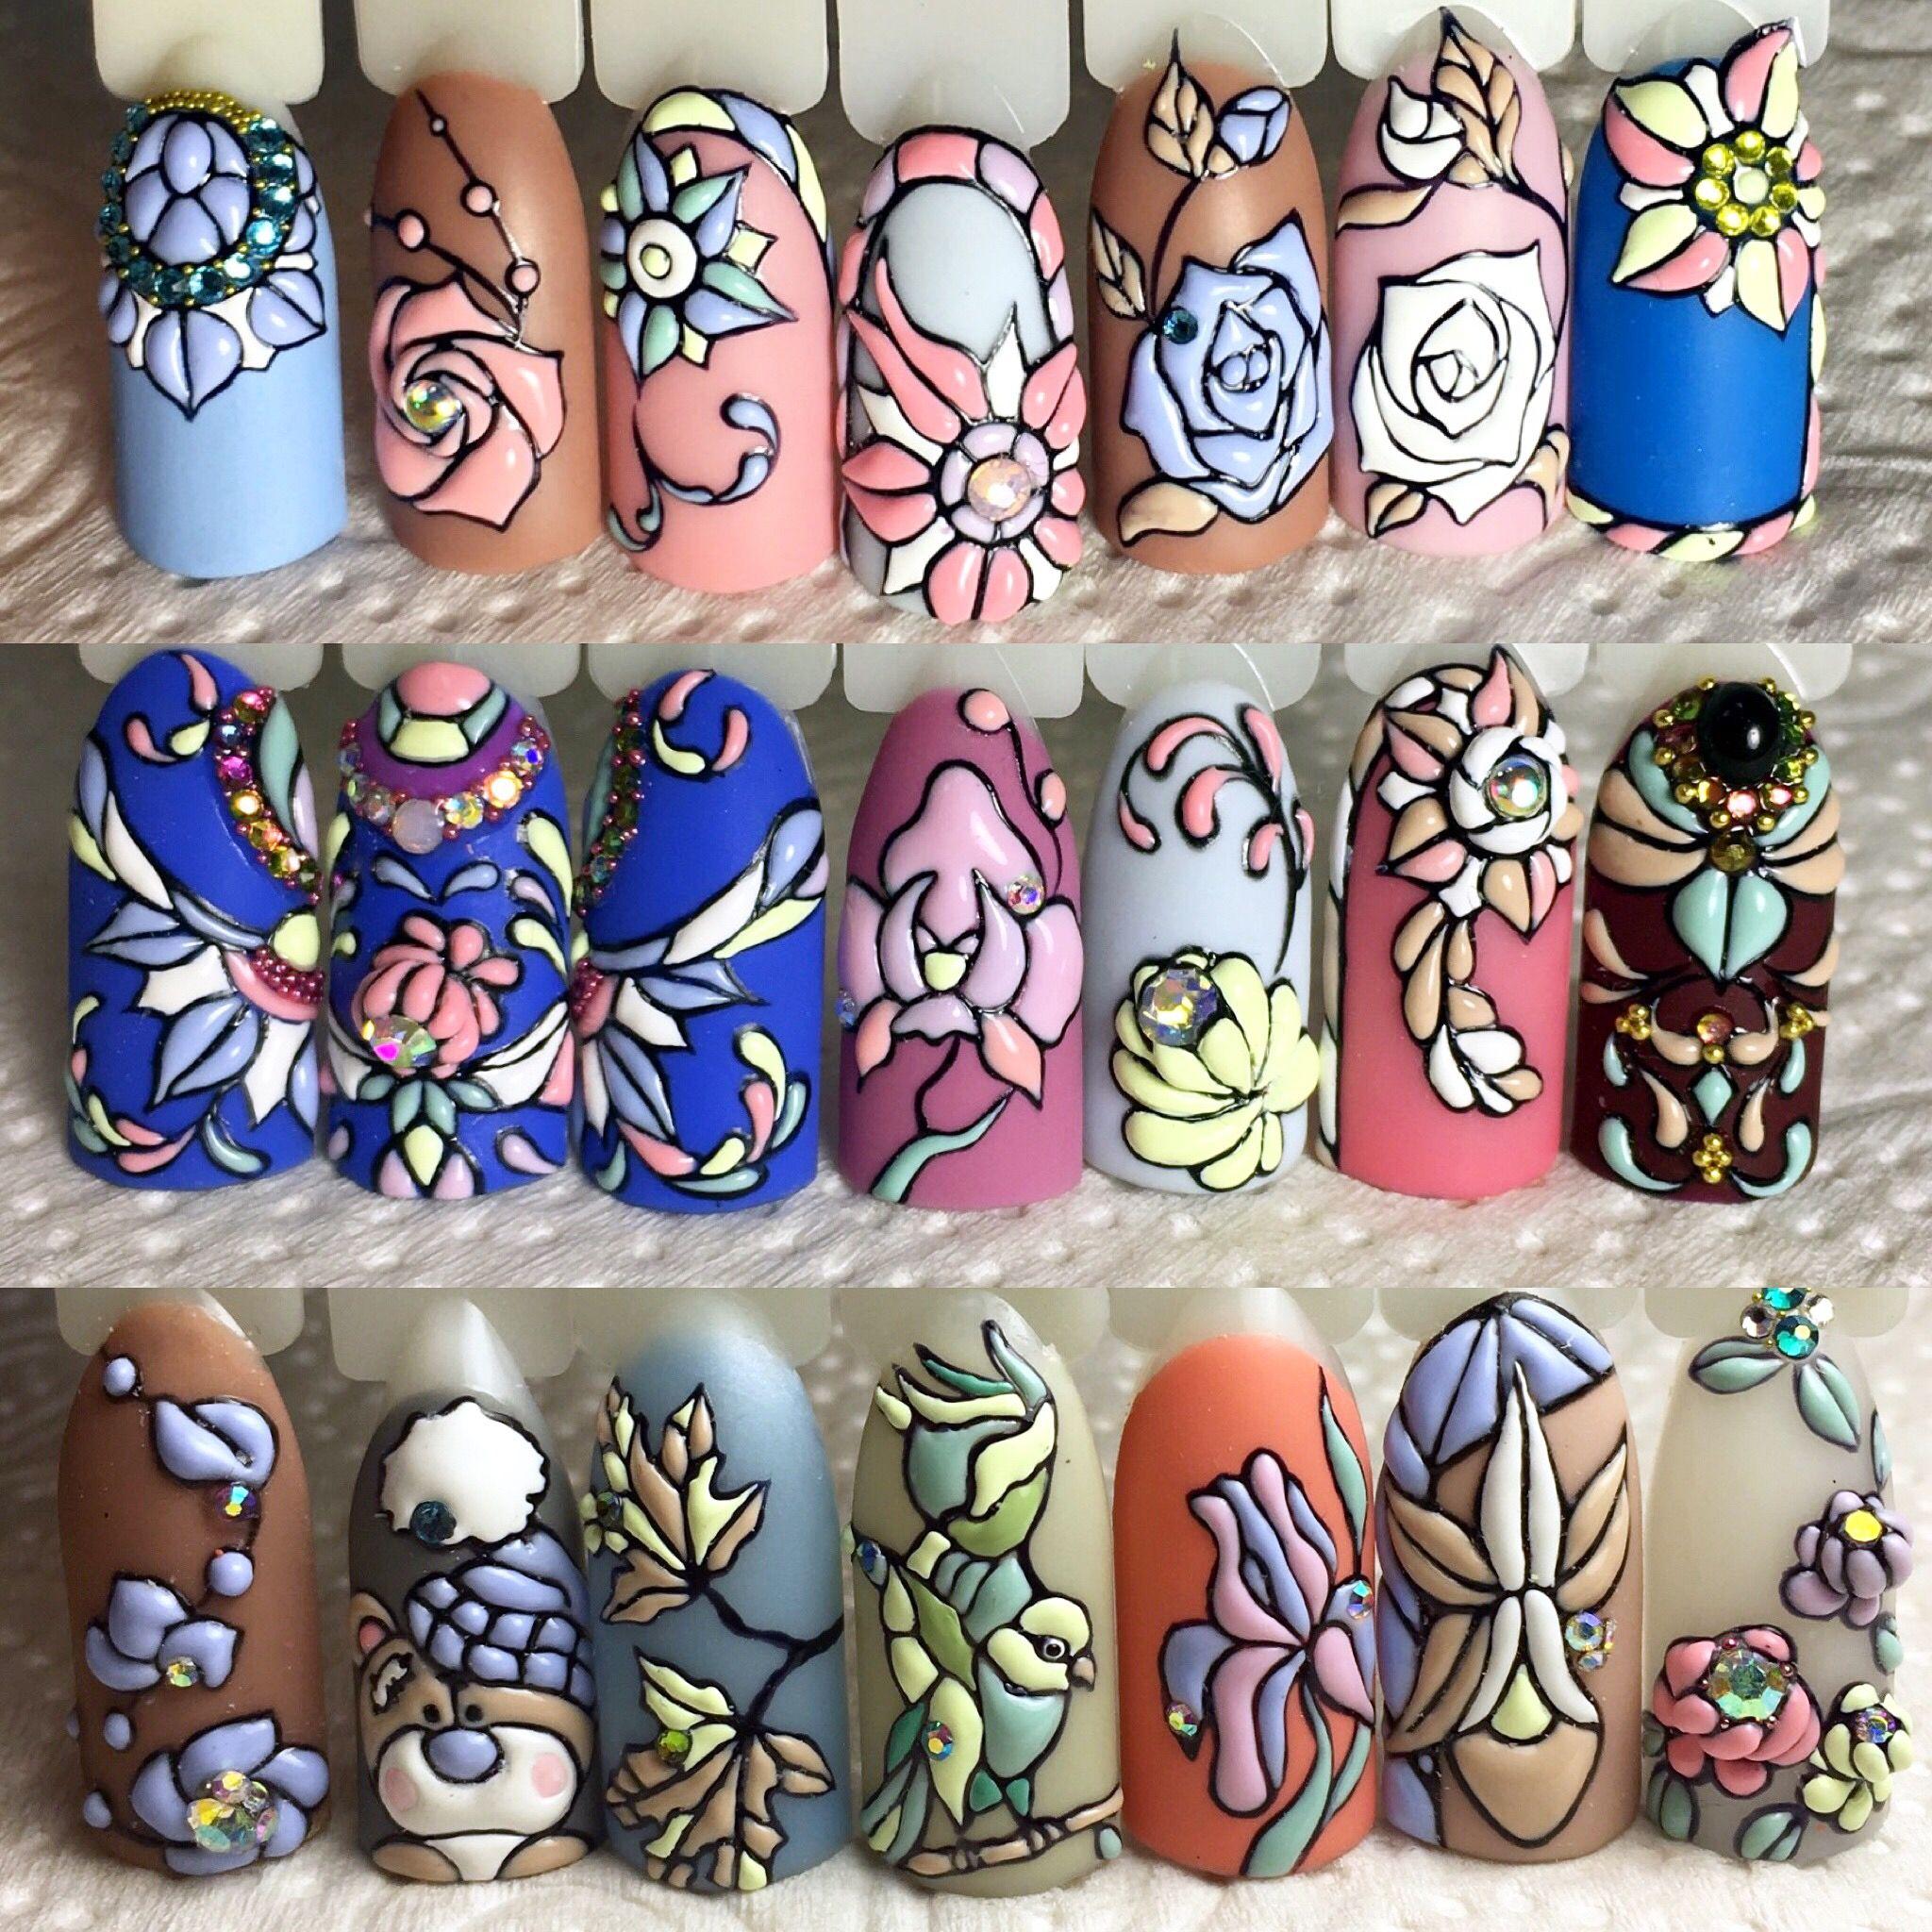 Свит Блюм дизайн ногтей Sweet bloom #sweetbloom #sweetblooms ...